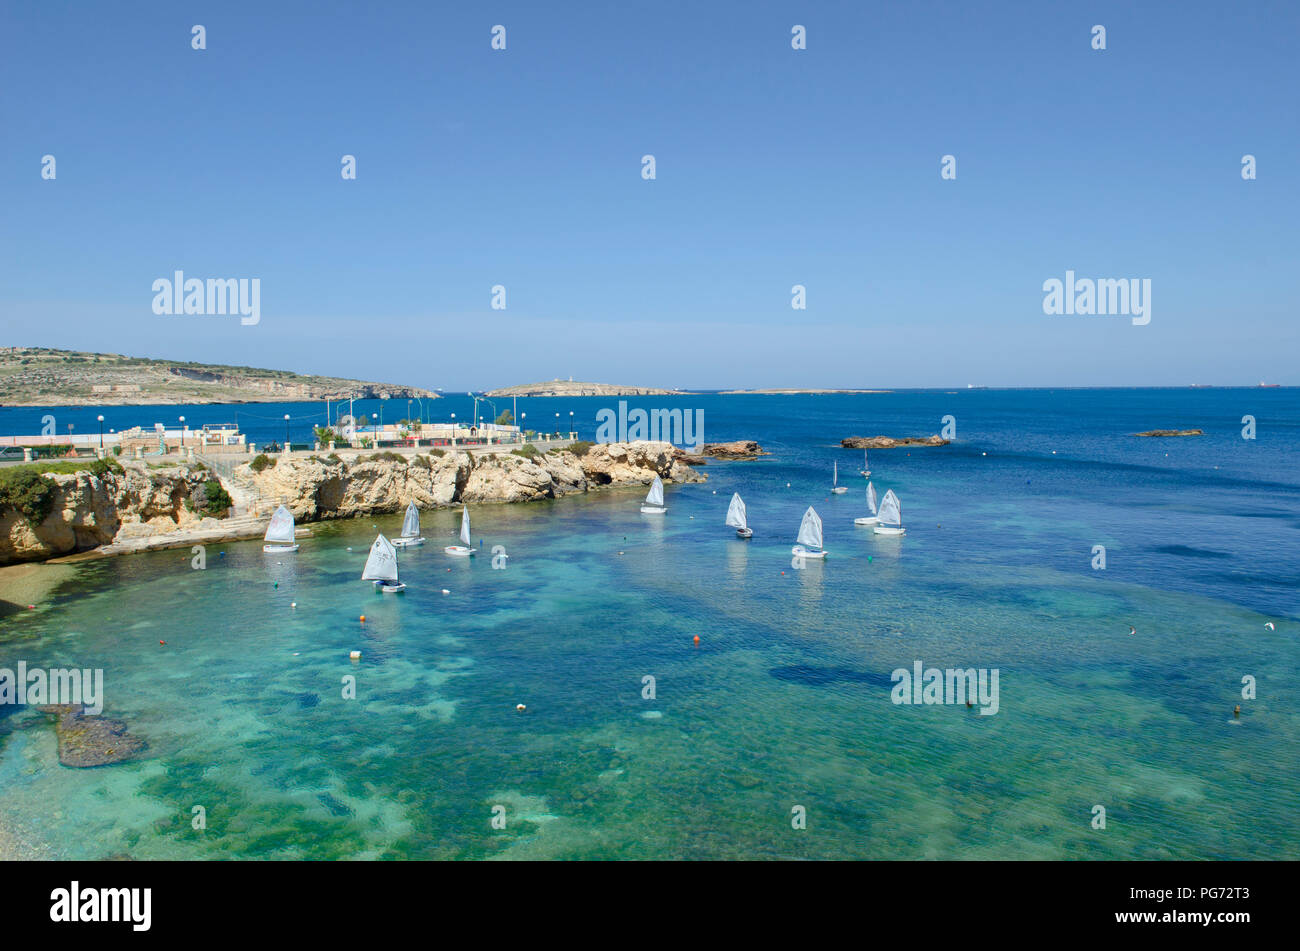 Malta Beach front  Valletta City Malta Seascape - Stock Image